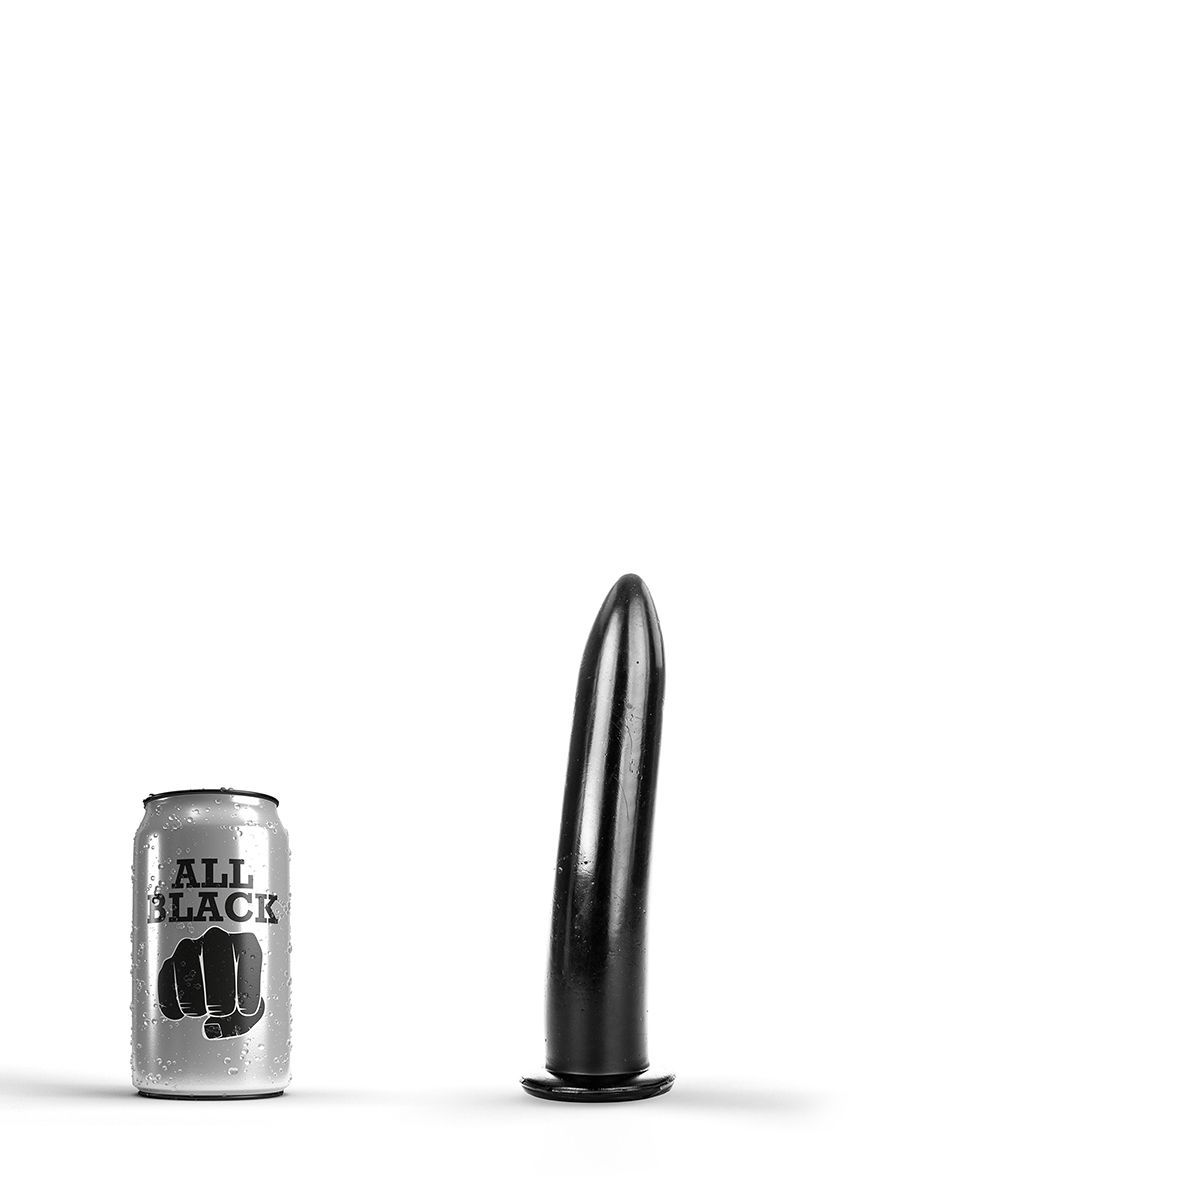 Image of All Black 6 - Glat anal dildo